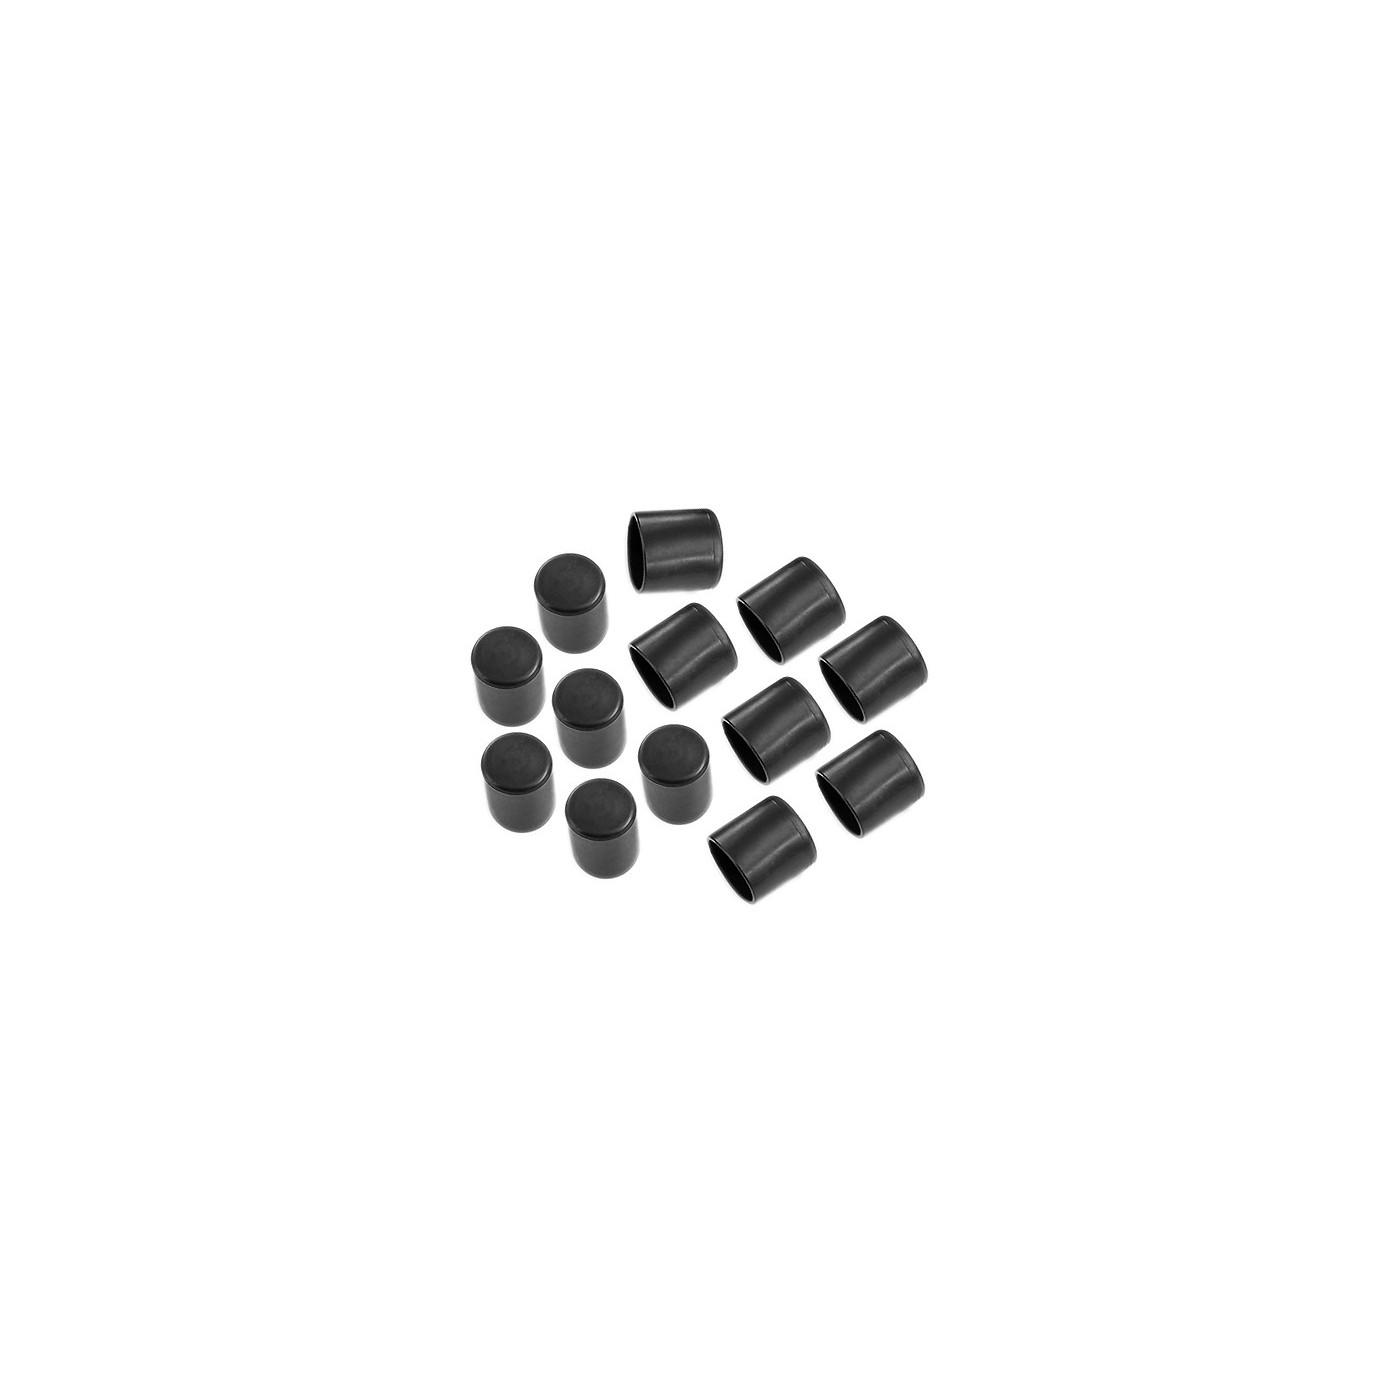 Set of 32 silicone chair leg caps (outside, round, 10 mm, black) [O-RO-10-B]  - 1